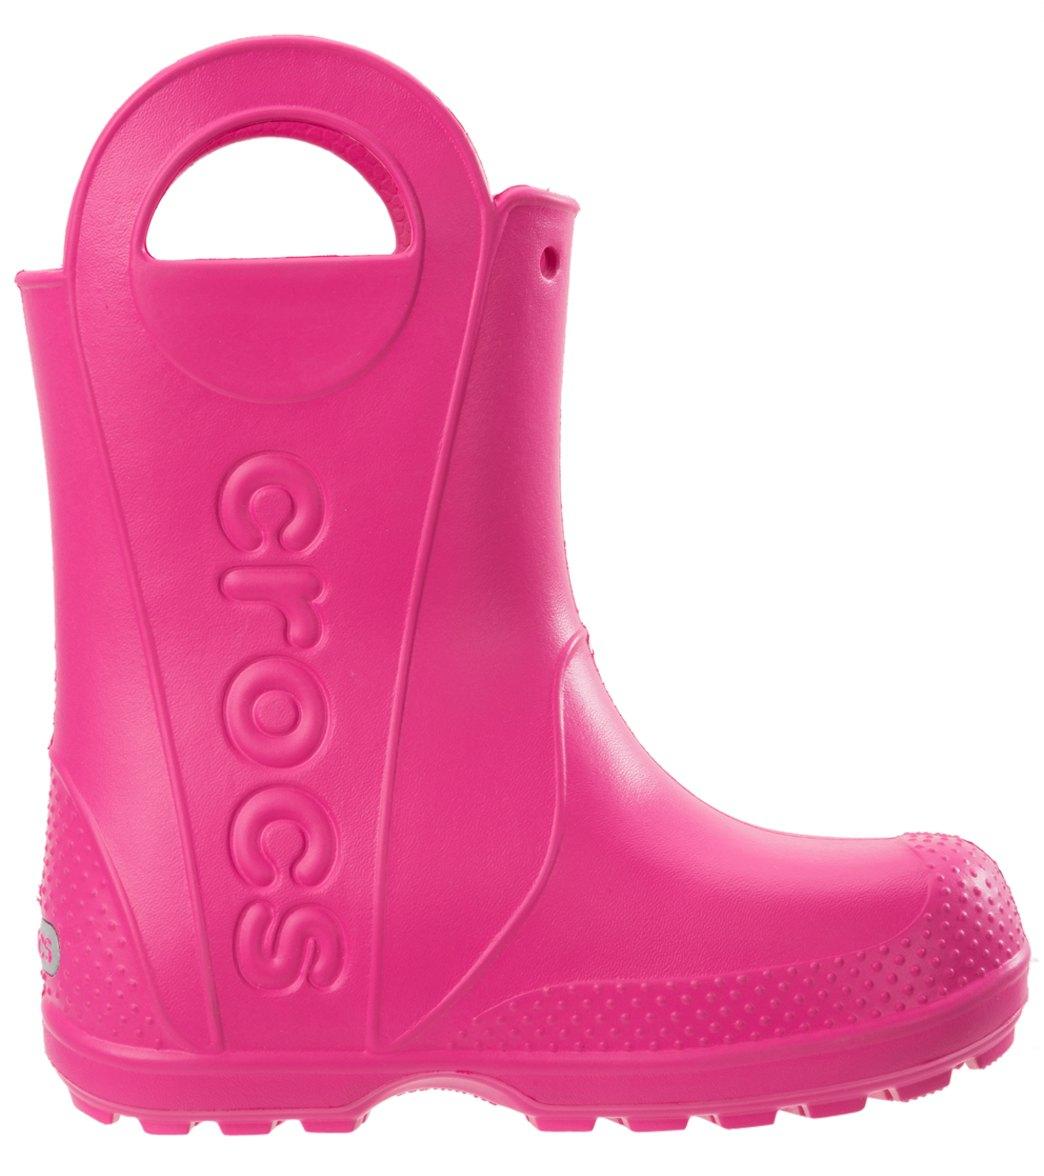 6e9f37d0c9de67 Crocs Kids  Handle It Rain Boot (Toddler Little Kid Big Kid) at ...